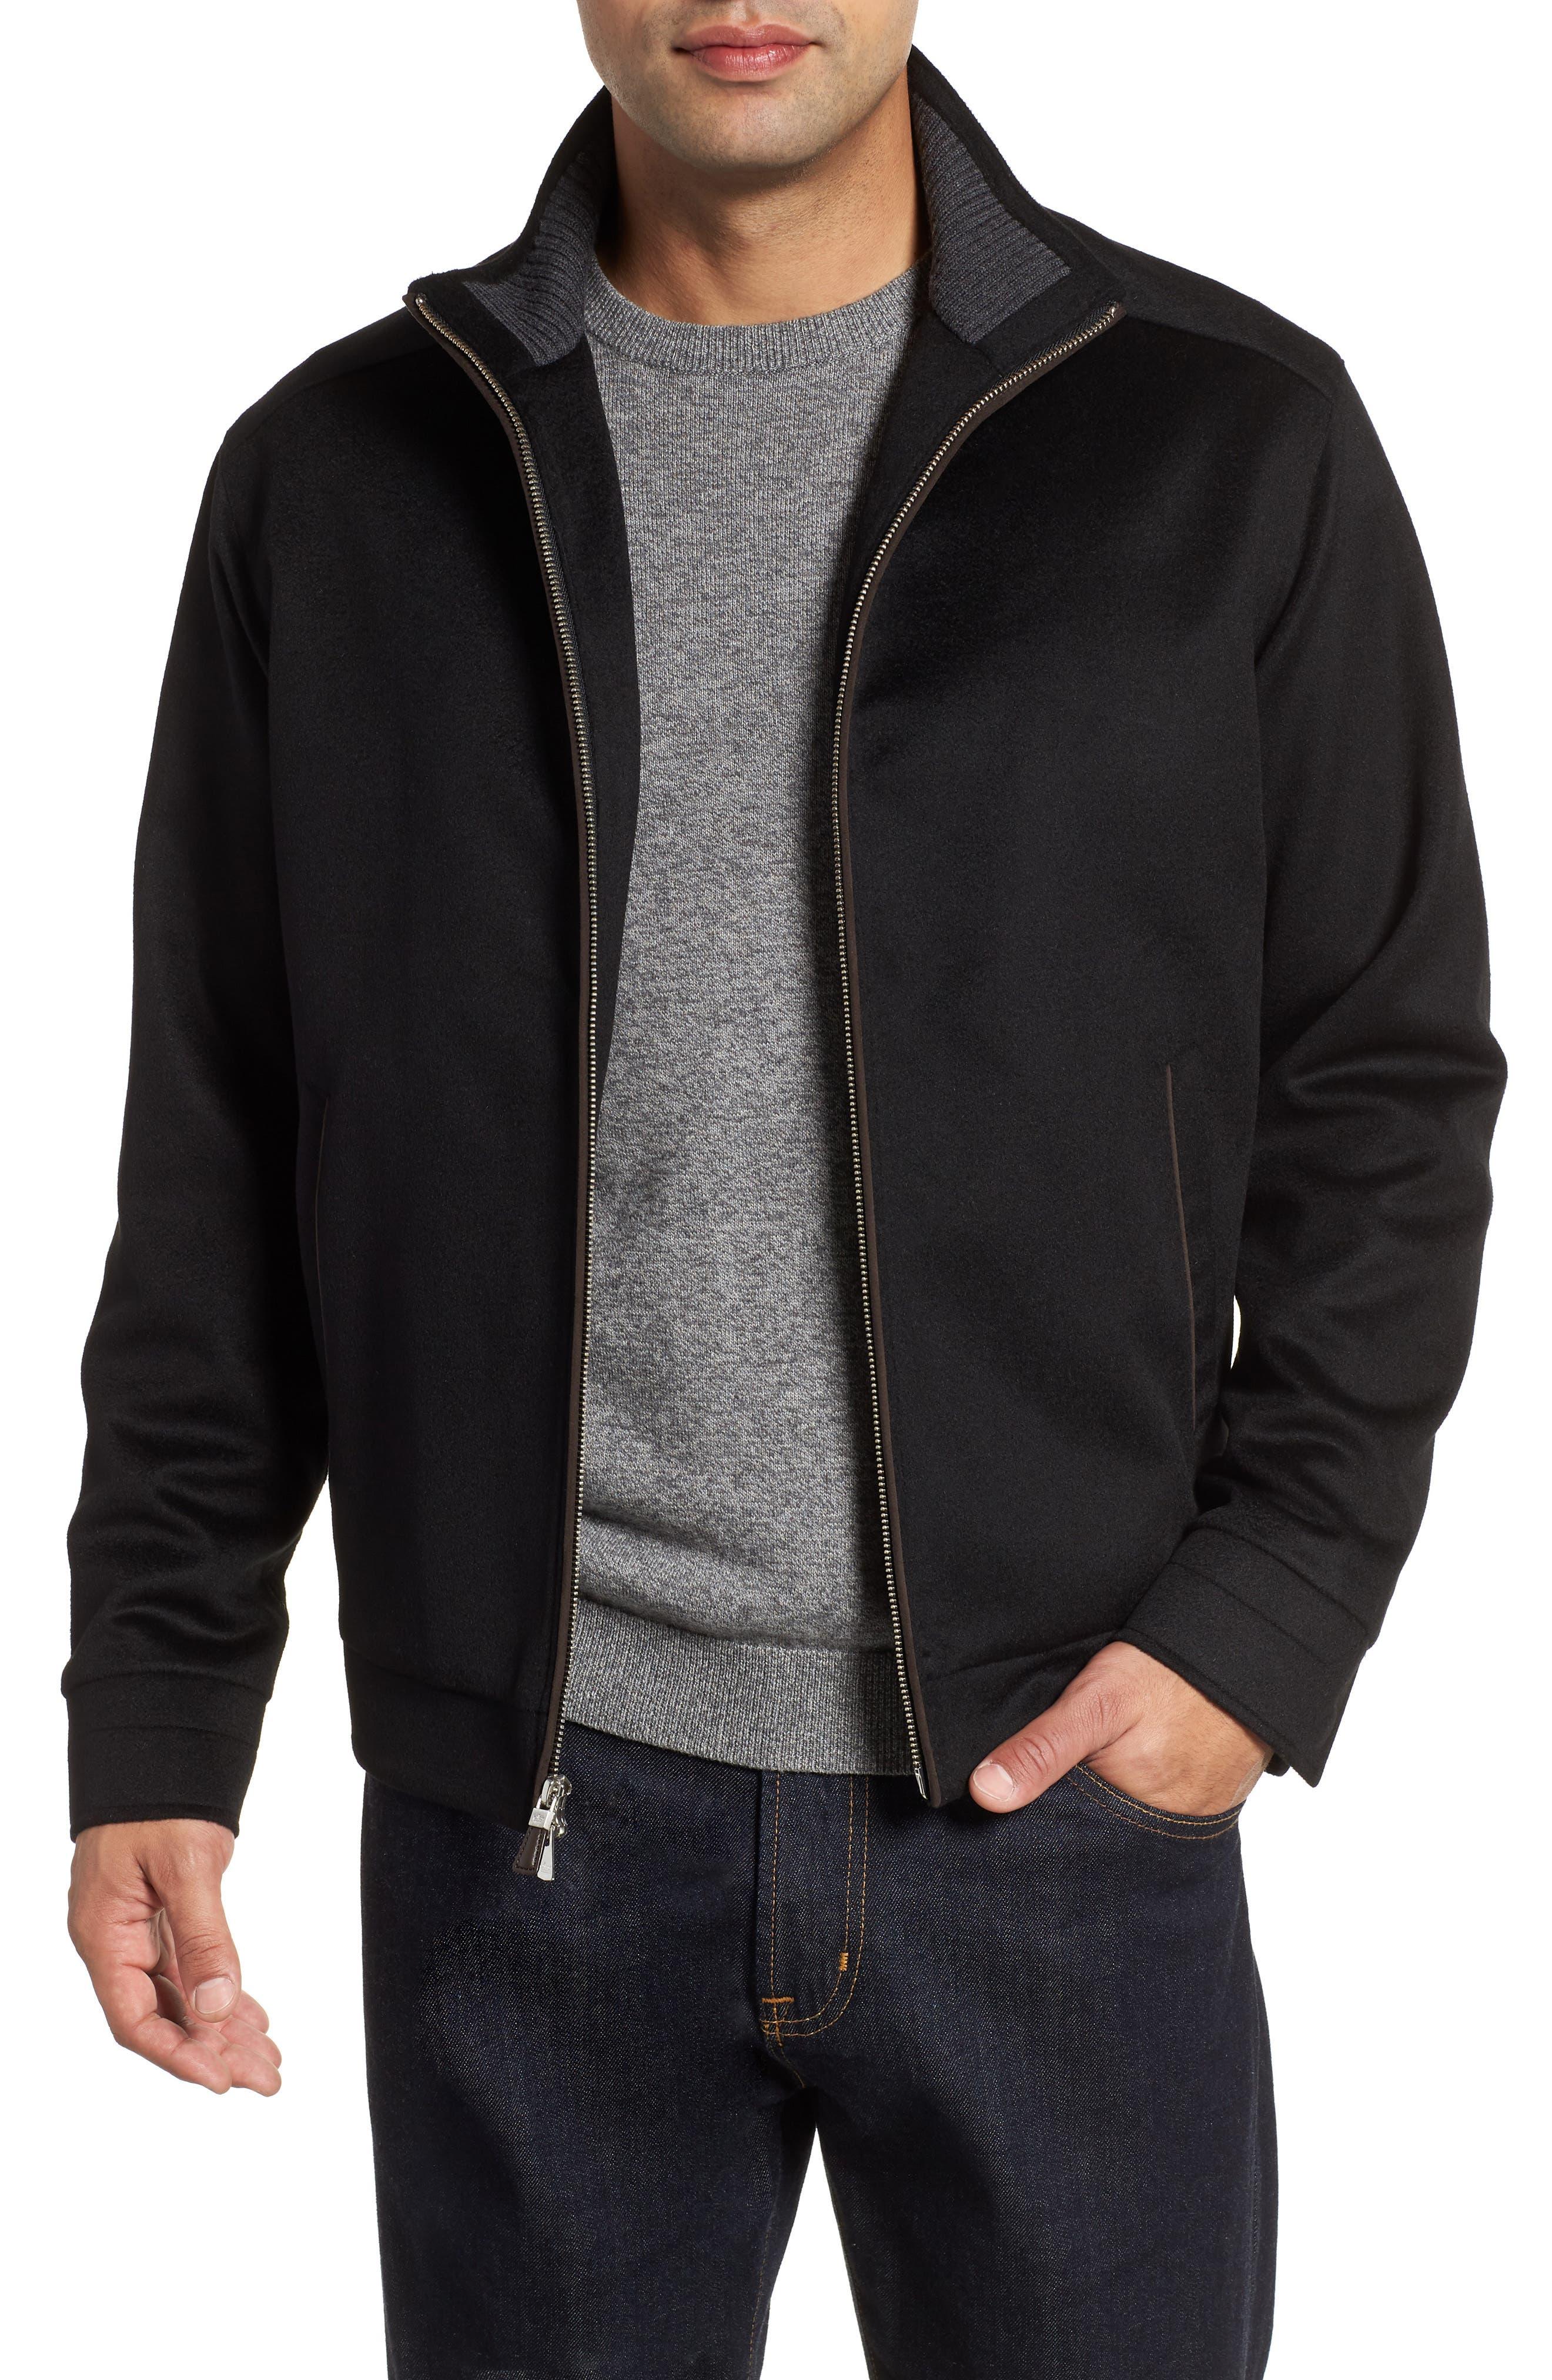 Westport Crown Wool & Cashmere Jacket,                             Main thumbnail 1, color,                             001